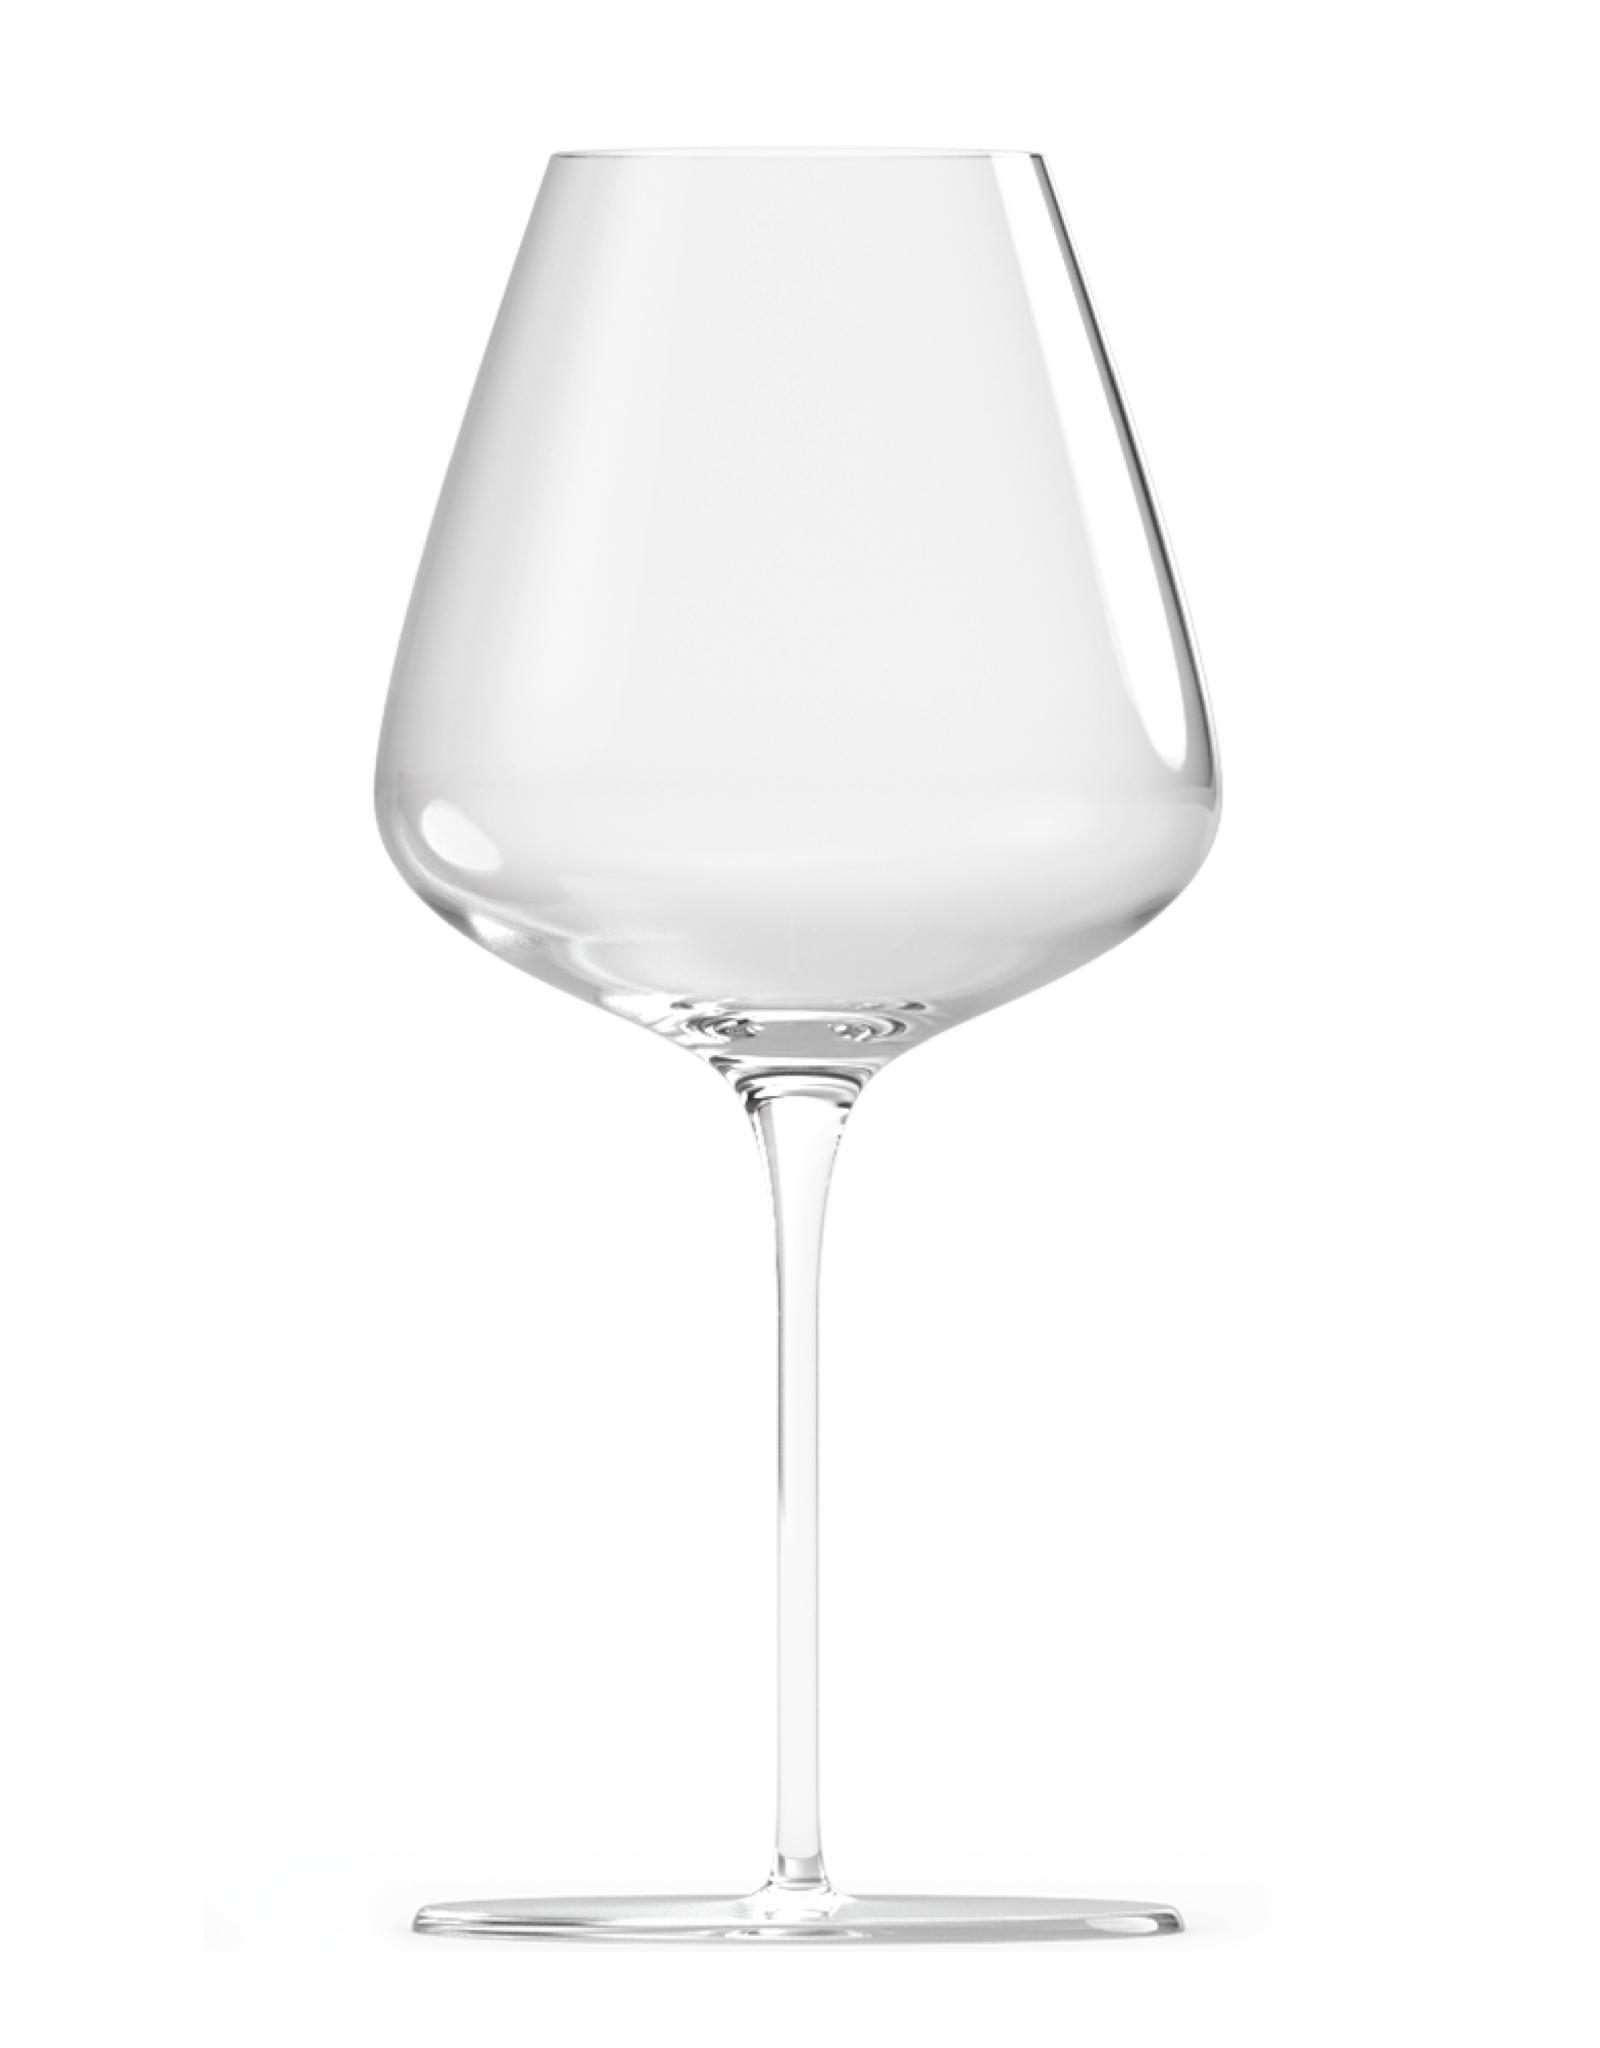 Grassl Glass Vigneron Series Cru